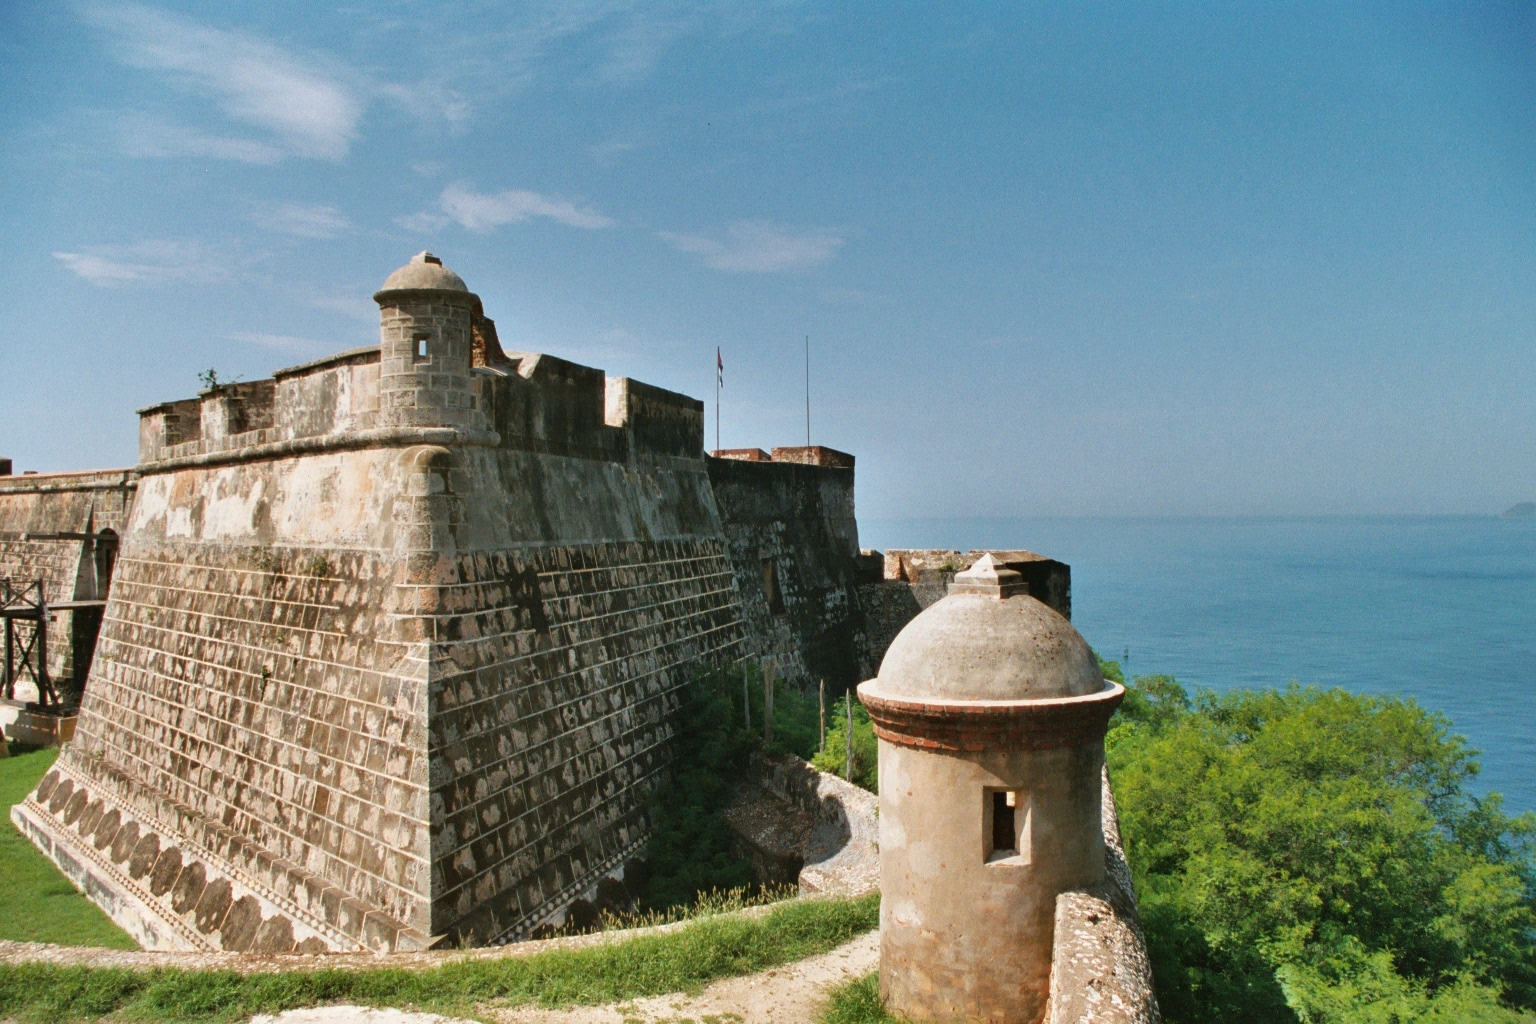 Fotos de leopoldo castillo 7